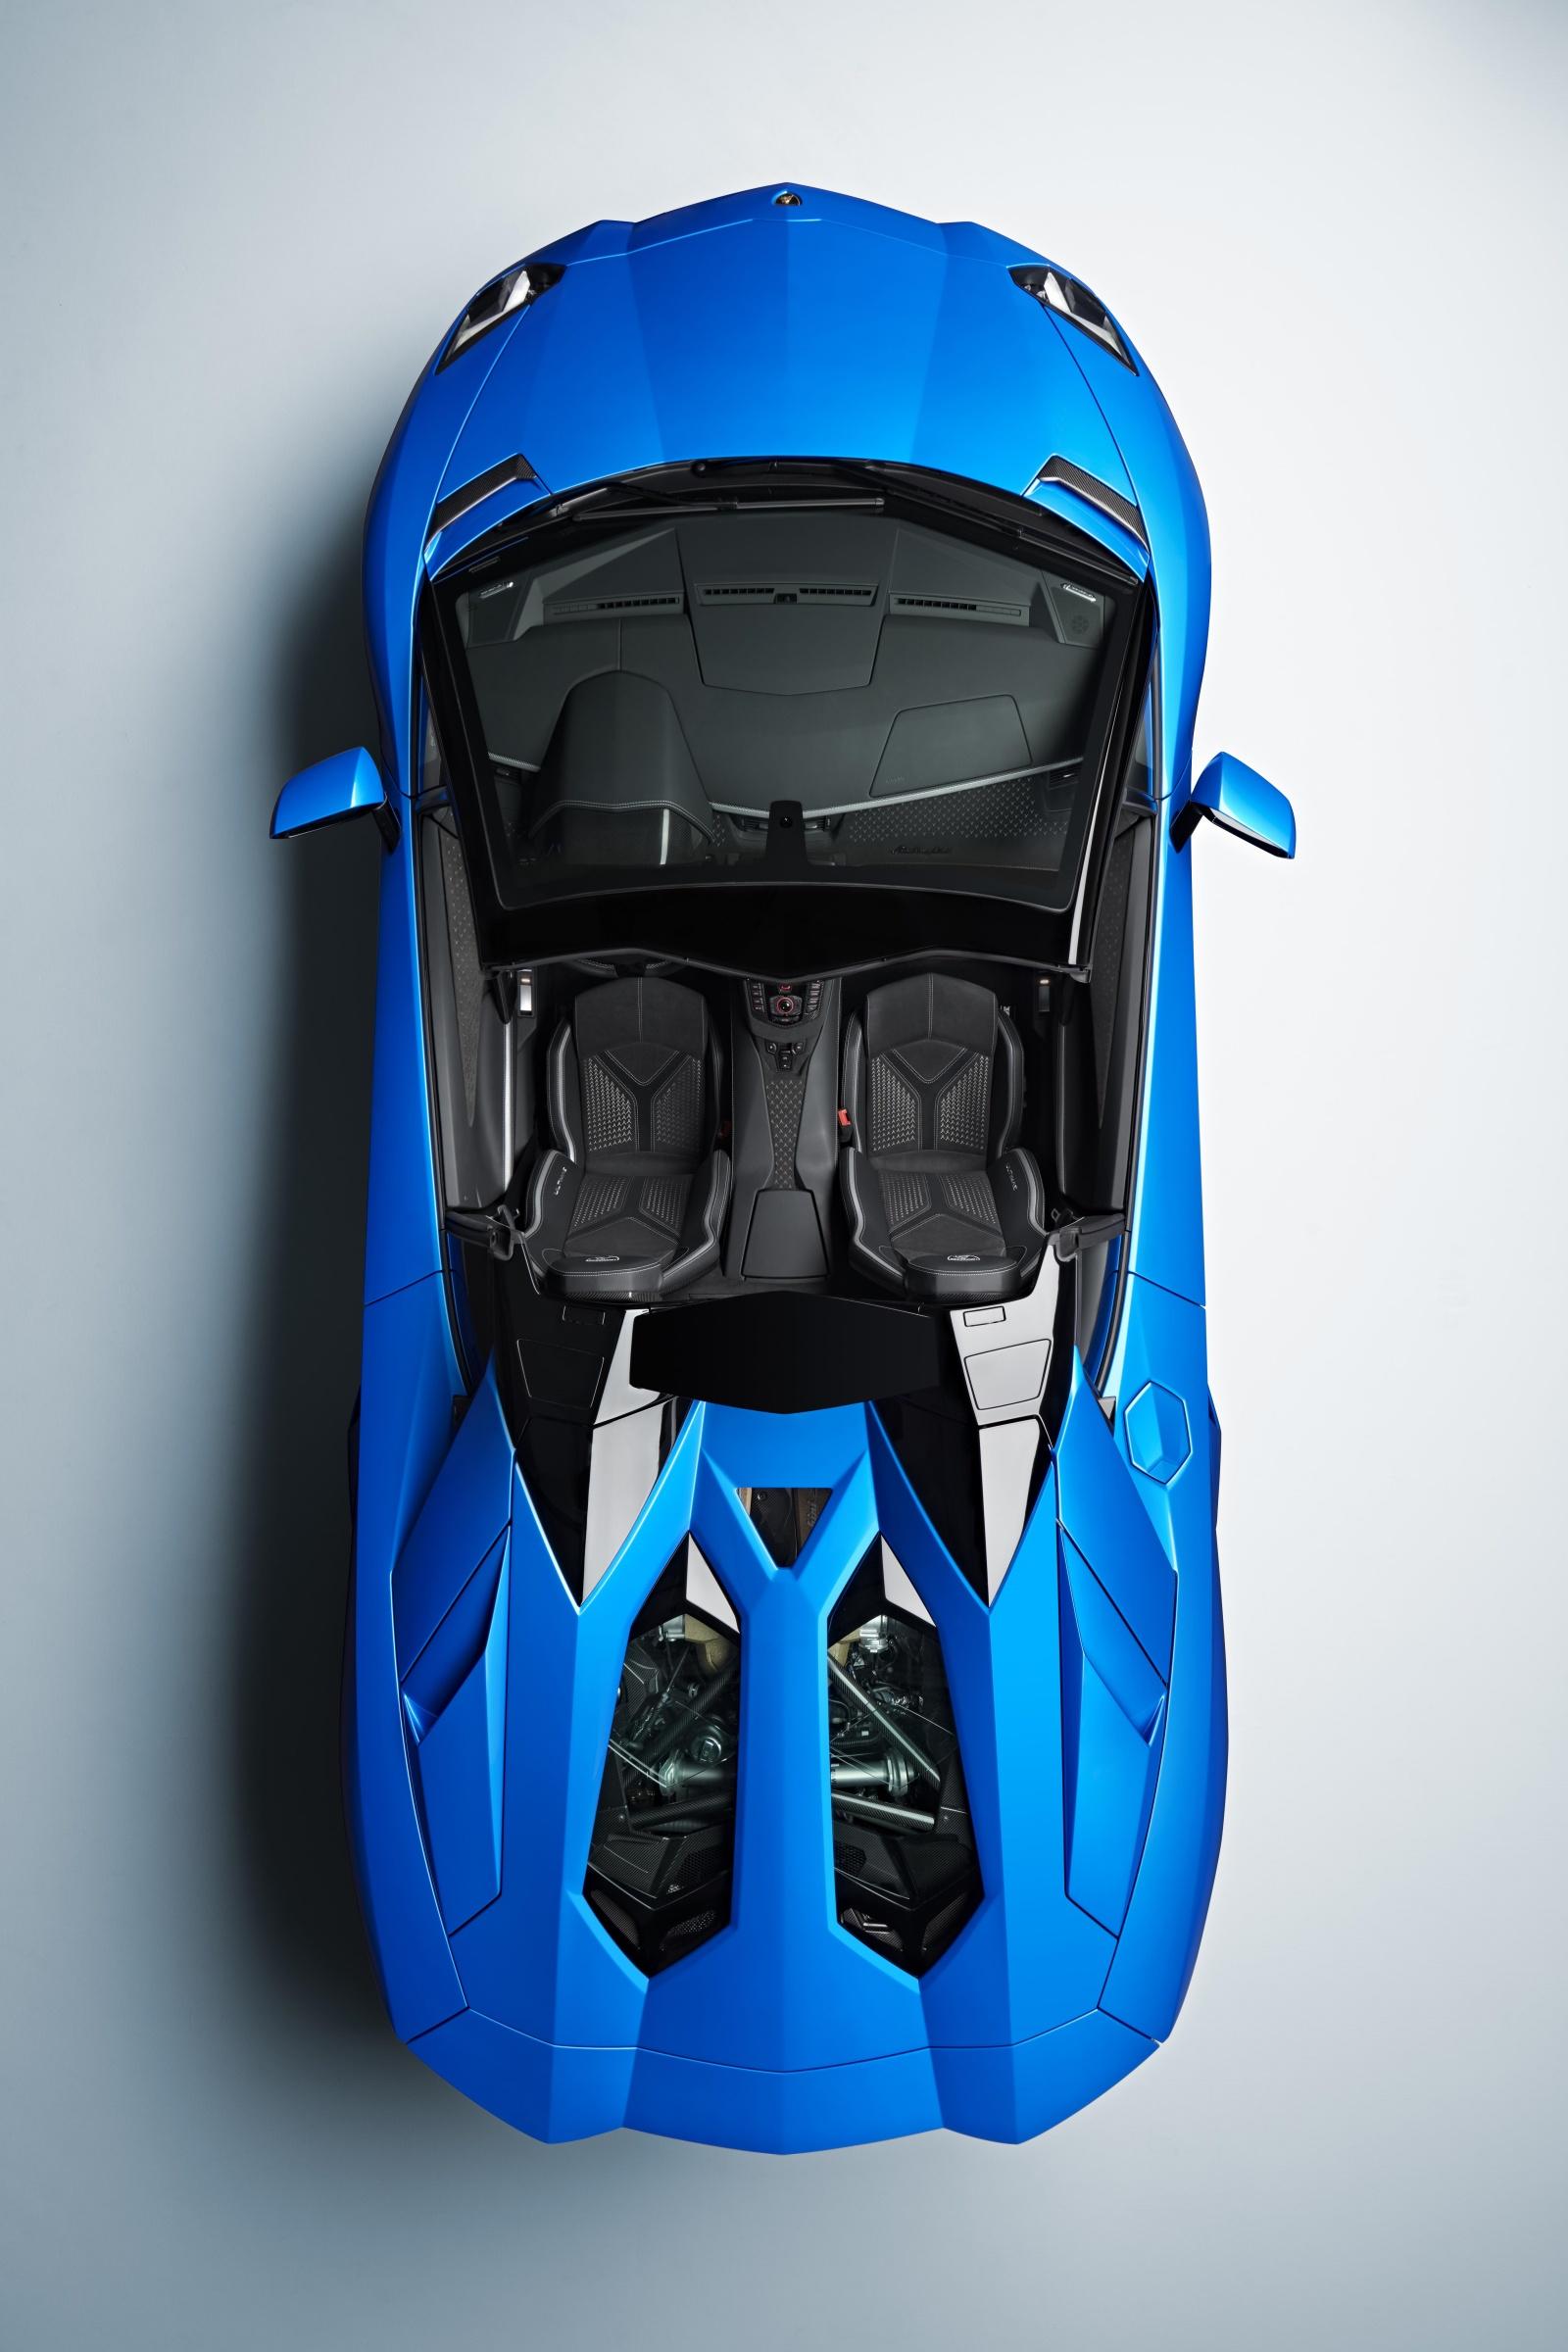 Lamborghini Aventador LP 780-4 Ultimae roadster - widok zgóry